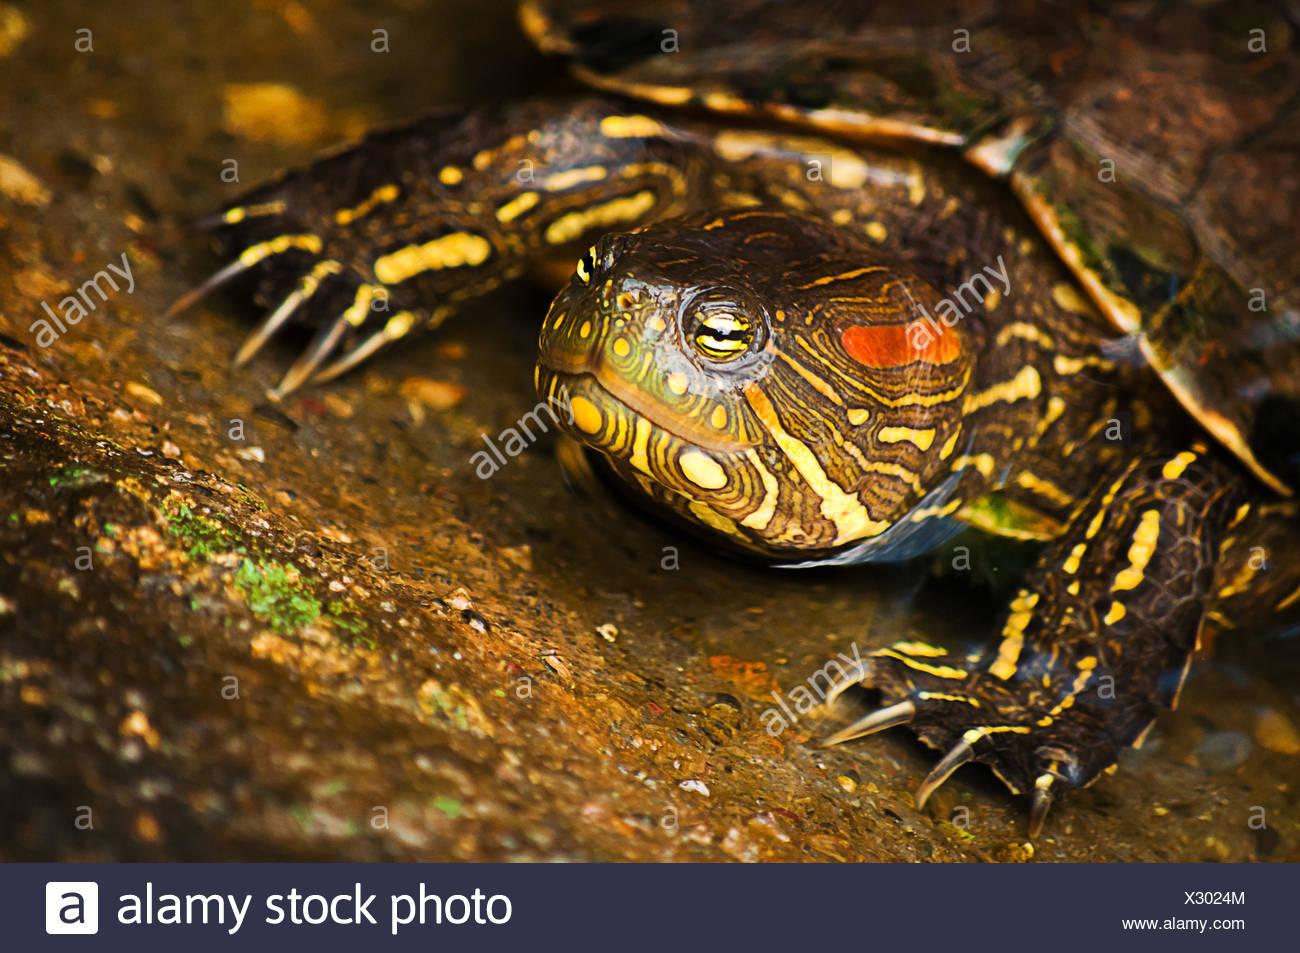 reptile, shell, exotic, turtle, maddening, pert, coquettish, cute, tortoise, - Stock Image